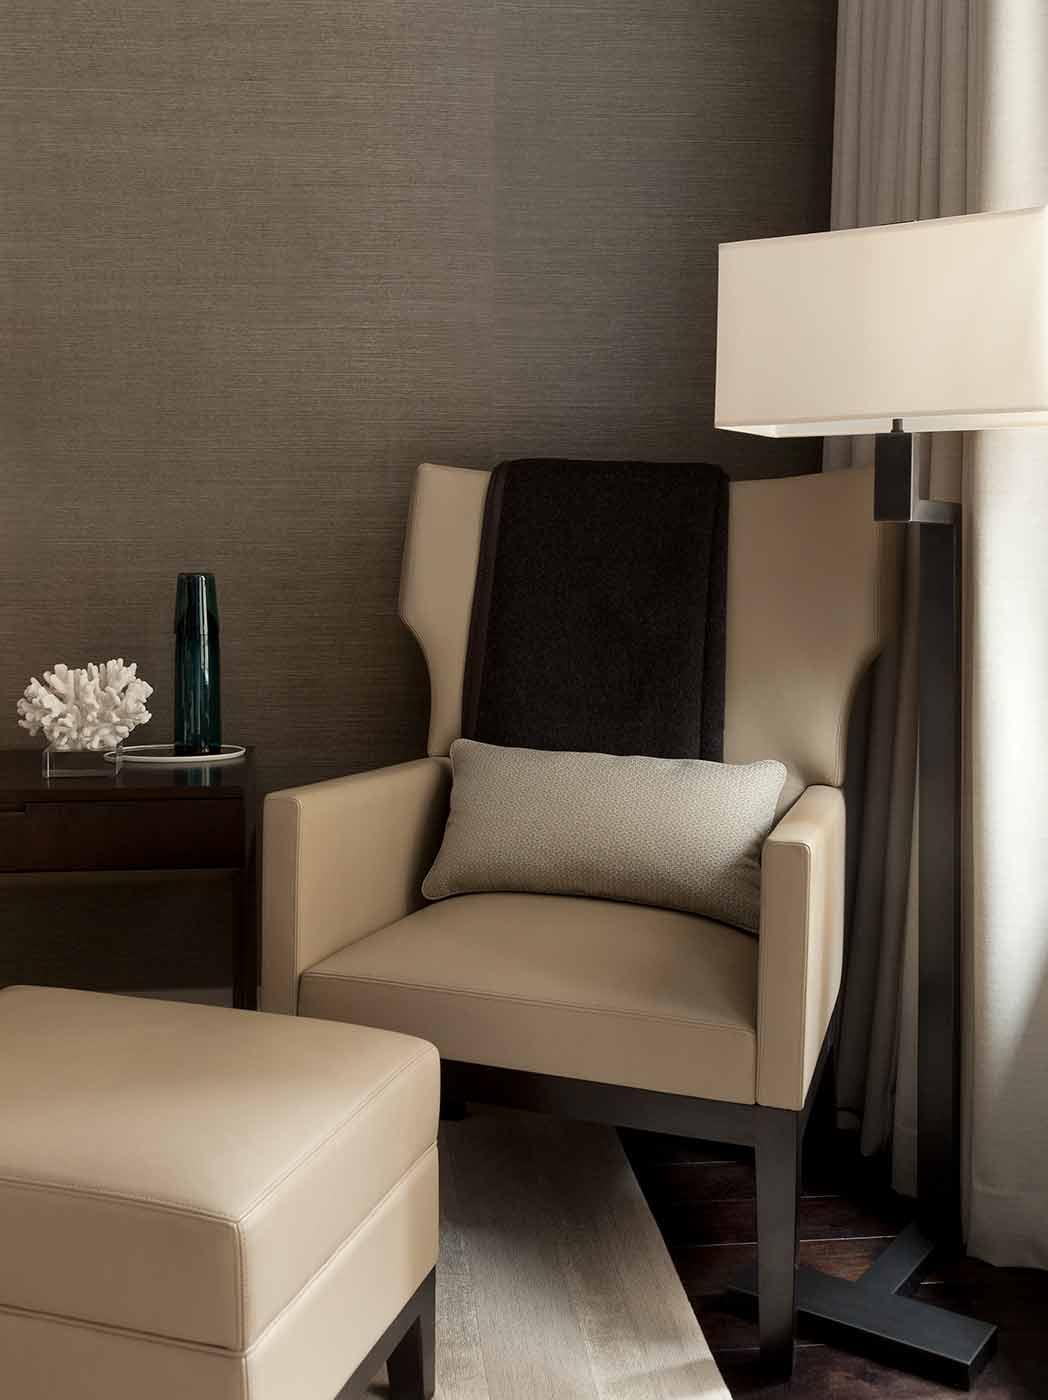 Bachelor pad masculine master bedroom – Blog by Darci Hether New York